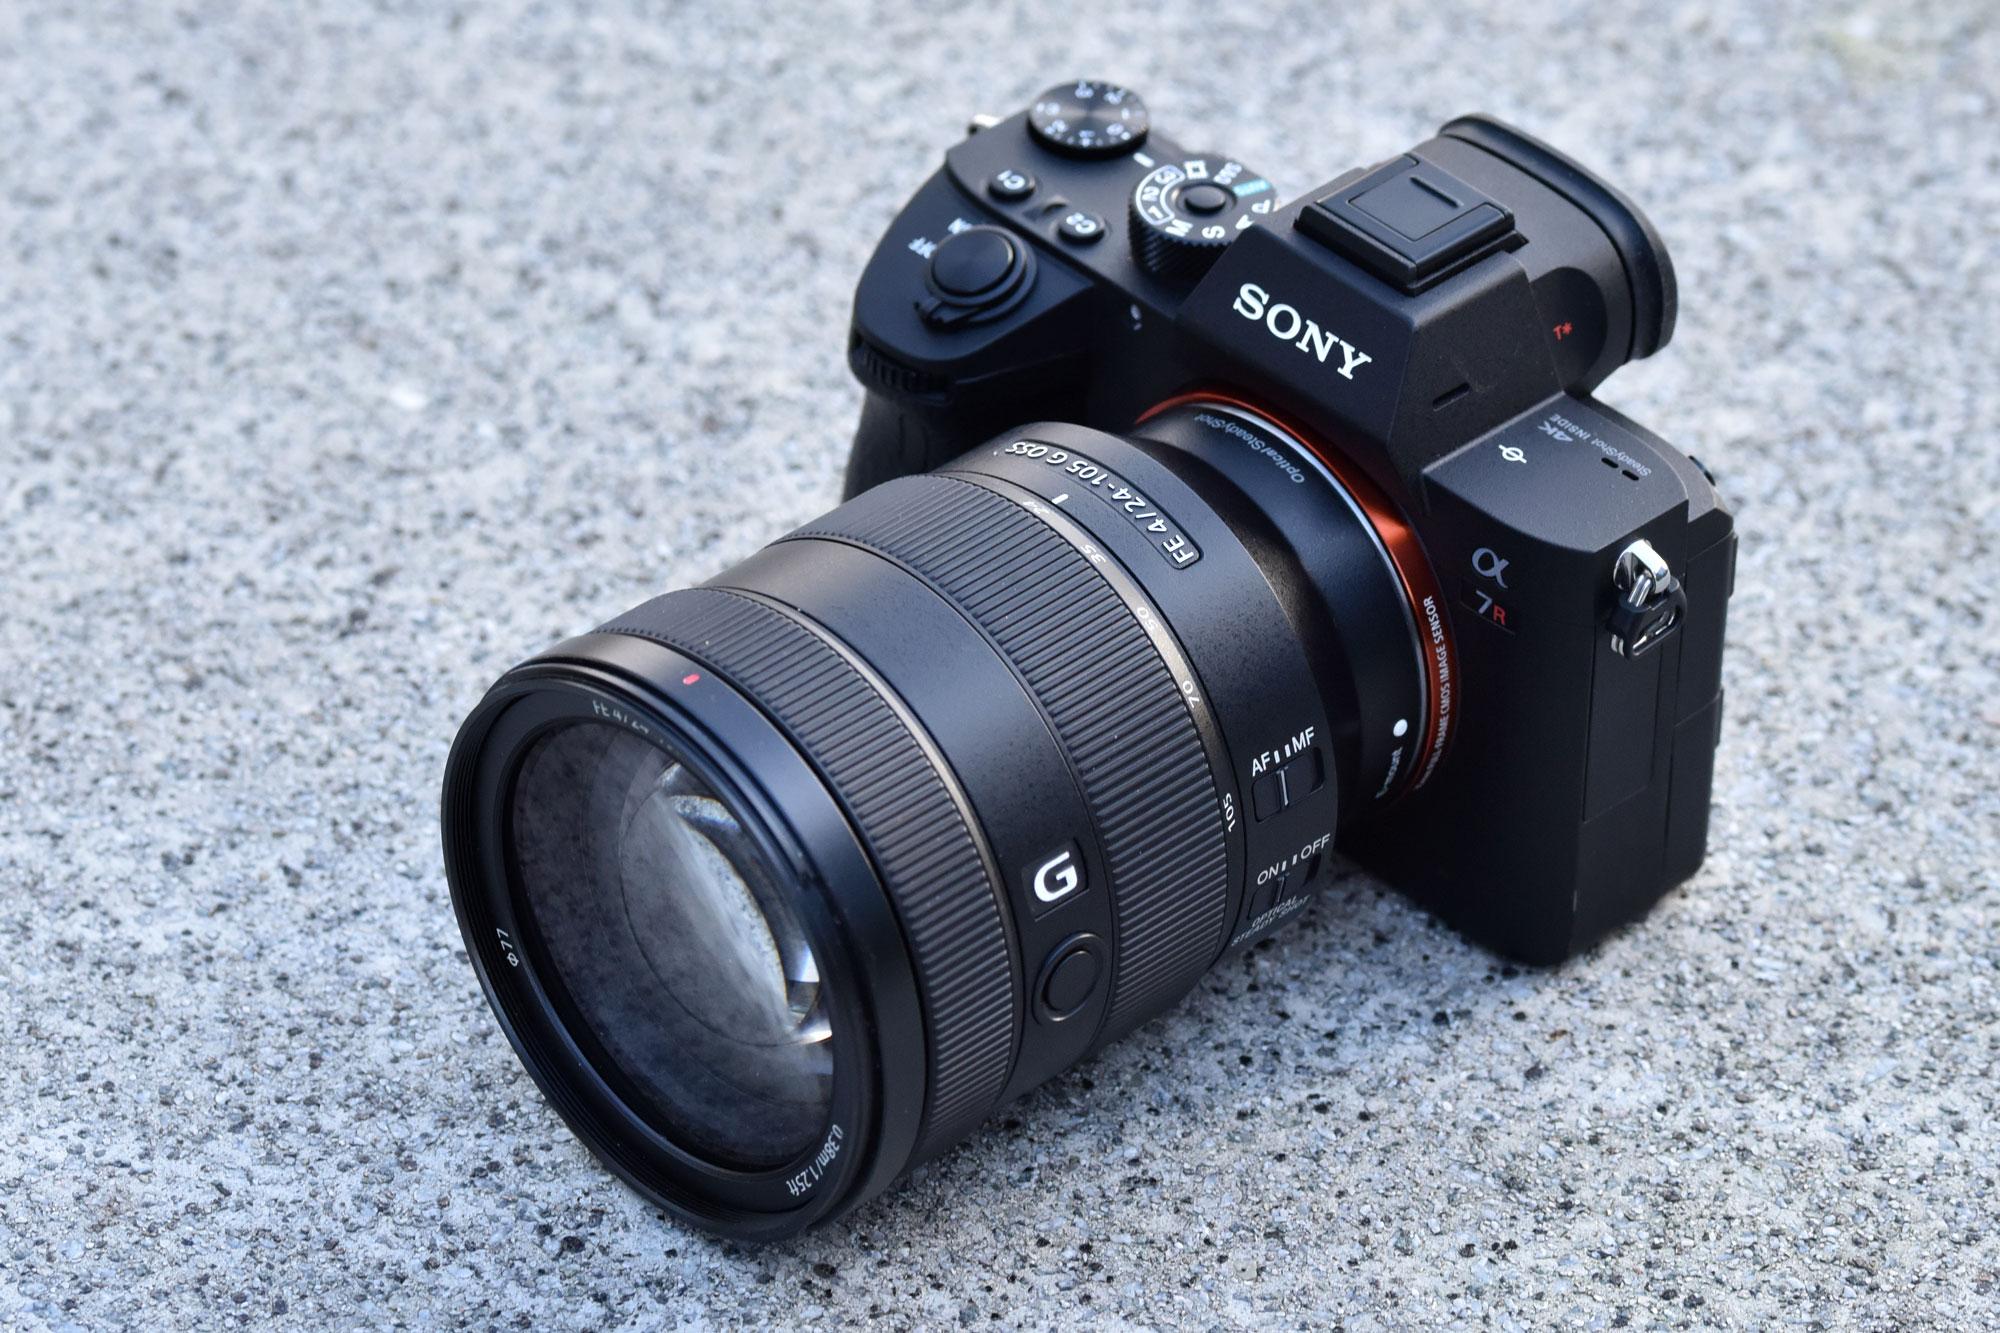 Sony 24 105mm On A7R III